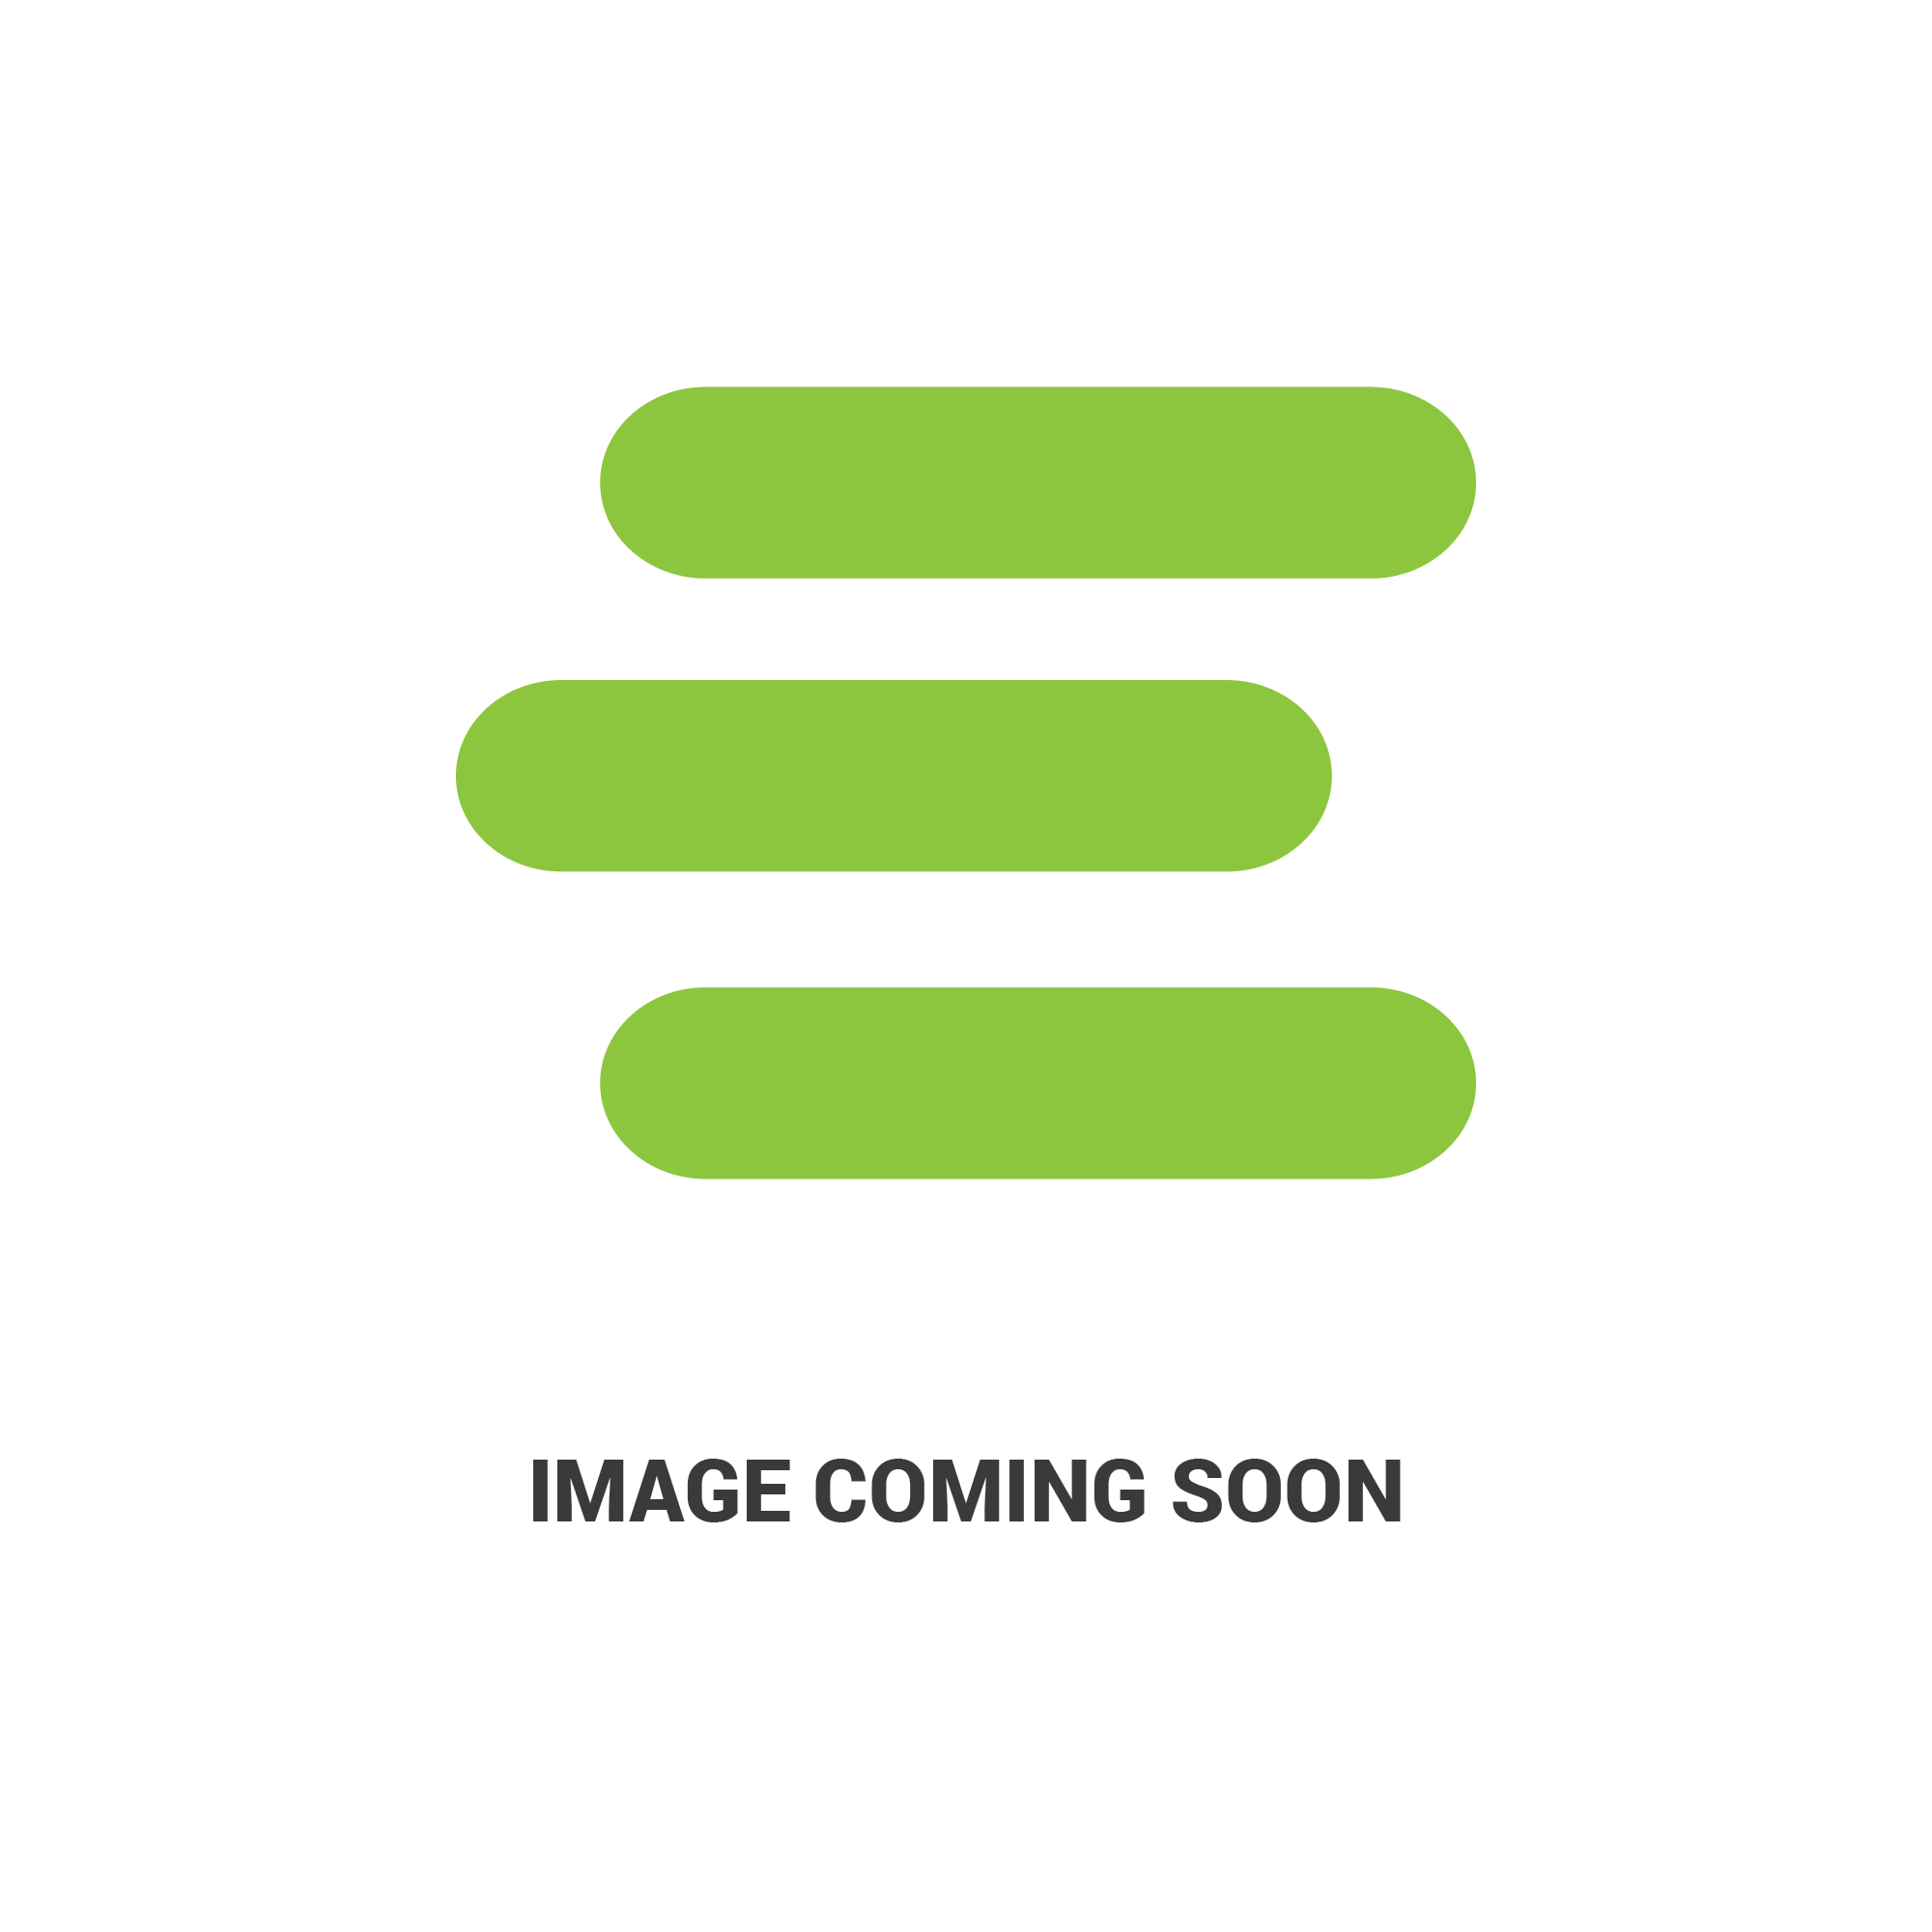 E-66917141129_1.jpg